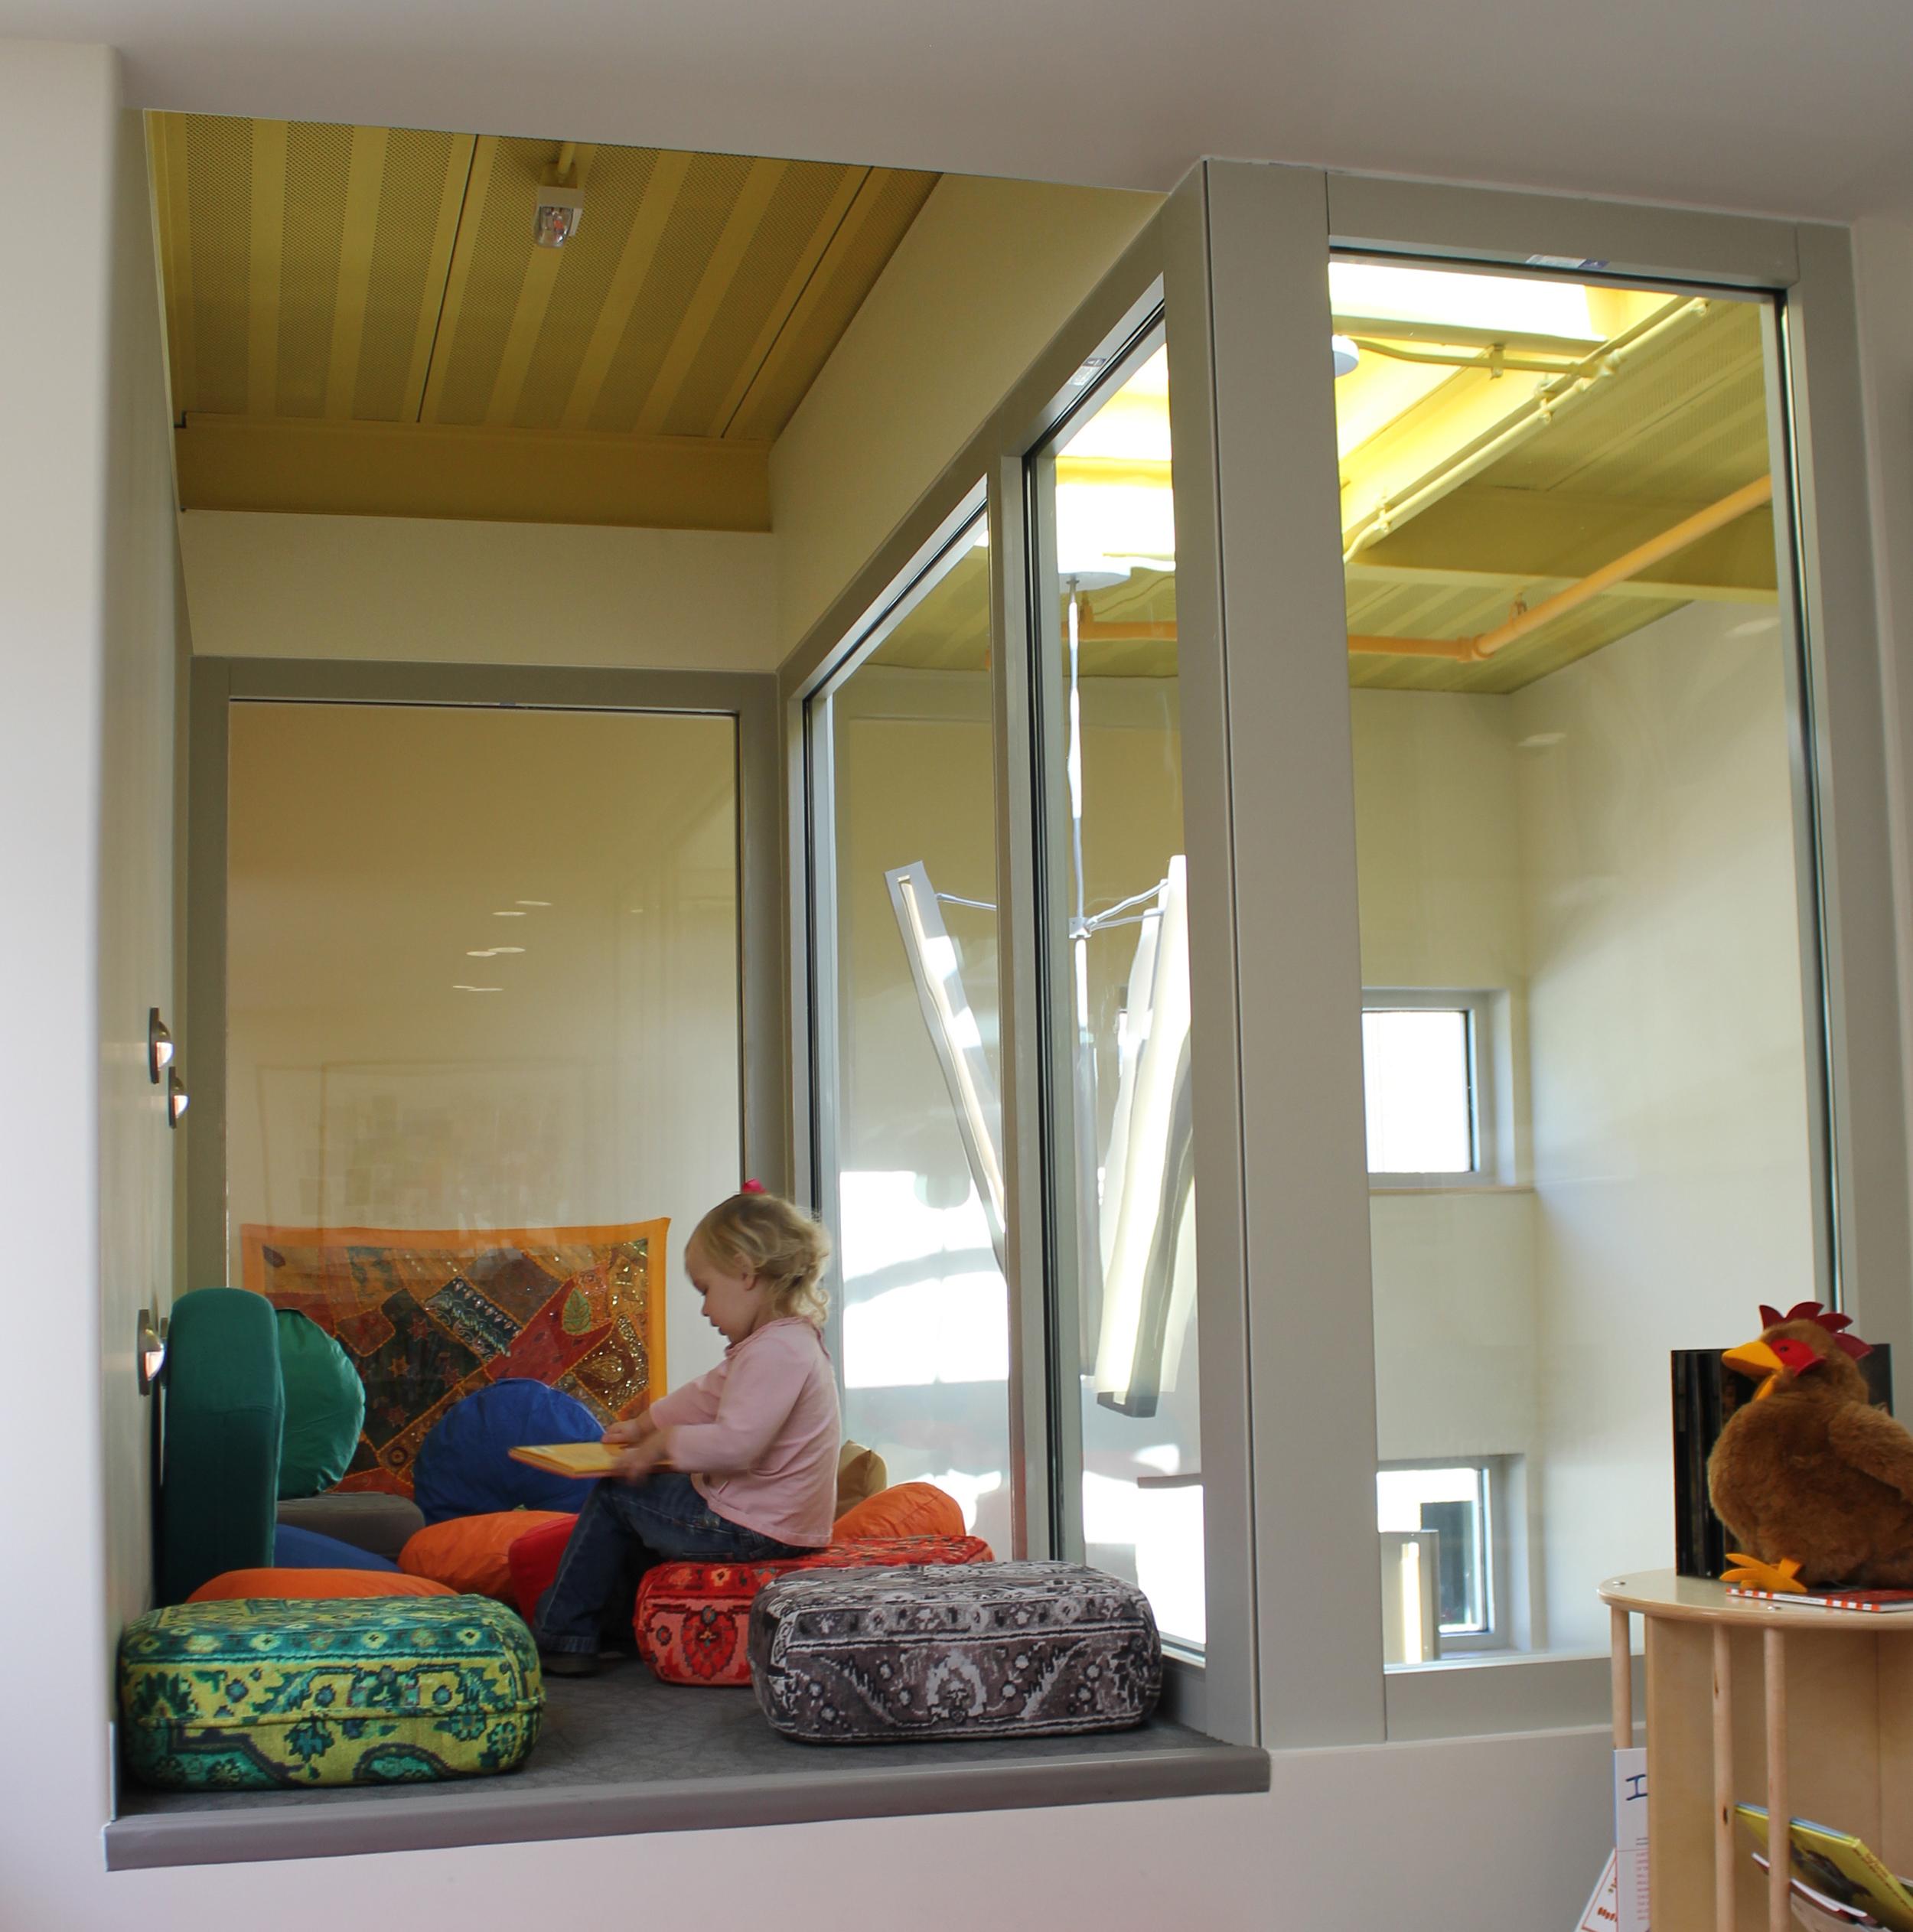 pho-int-stair loft reading-sq crop 300ppi-9x9.jpg